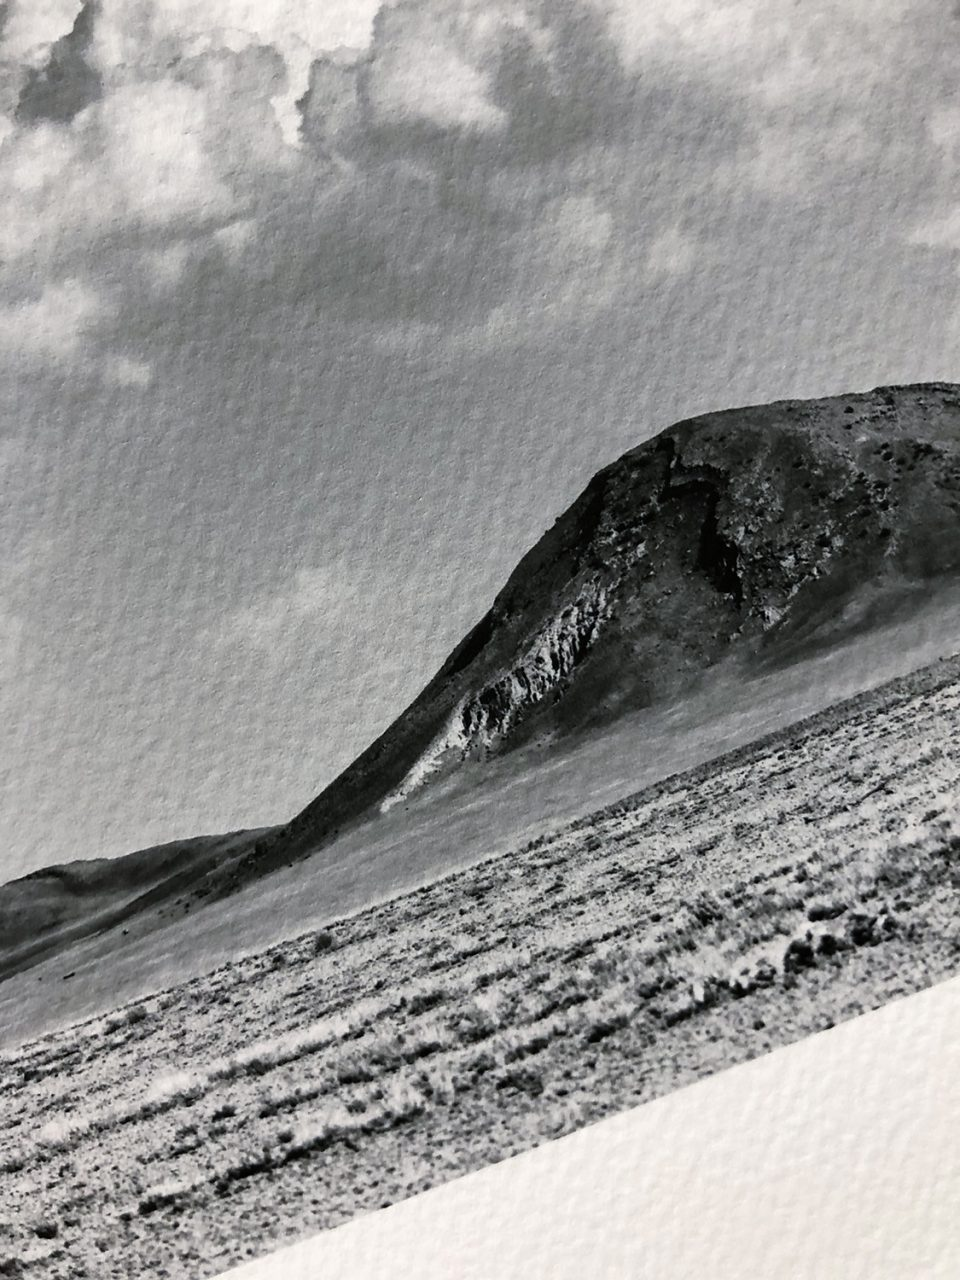 Sample print on Canson Infinity Velin Museum Rag.